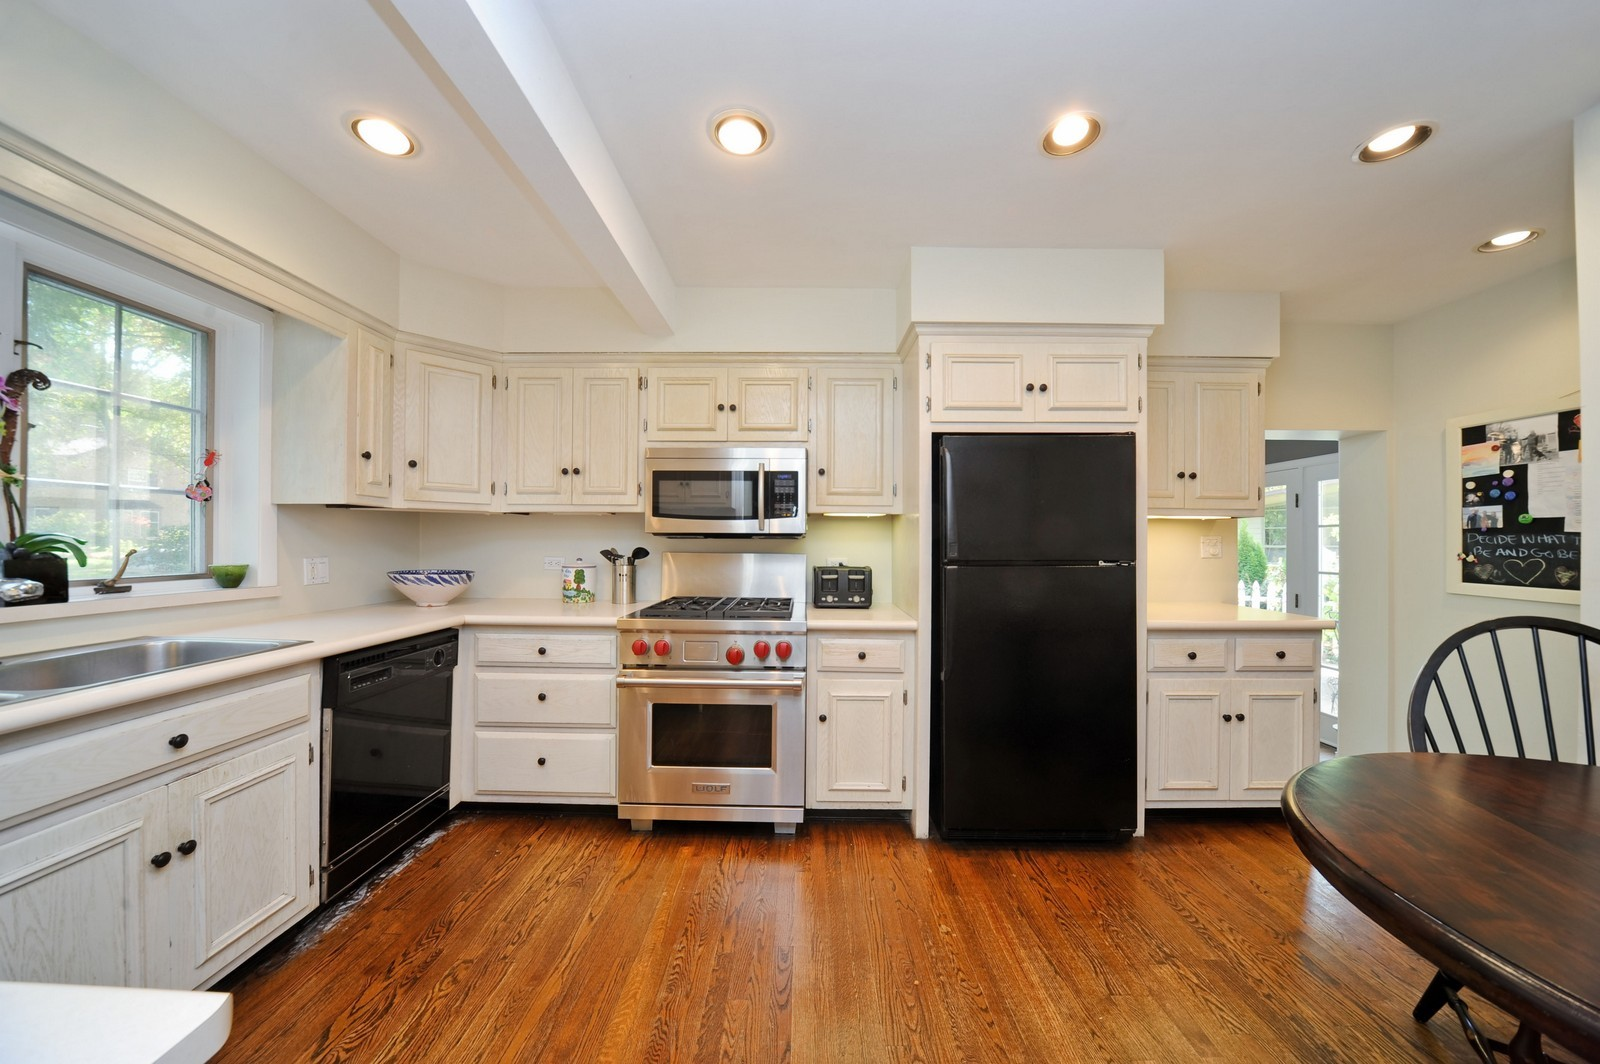 Real Estate Photography - 587 Melody, Highland Park, IL, 60035 - Kitchen